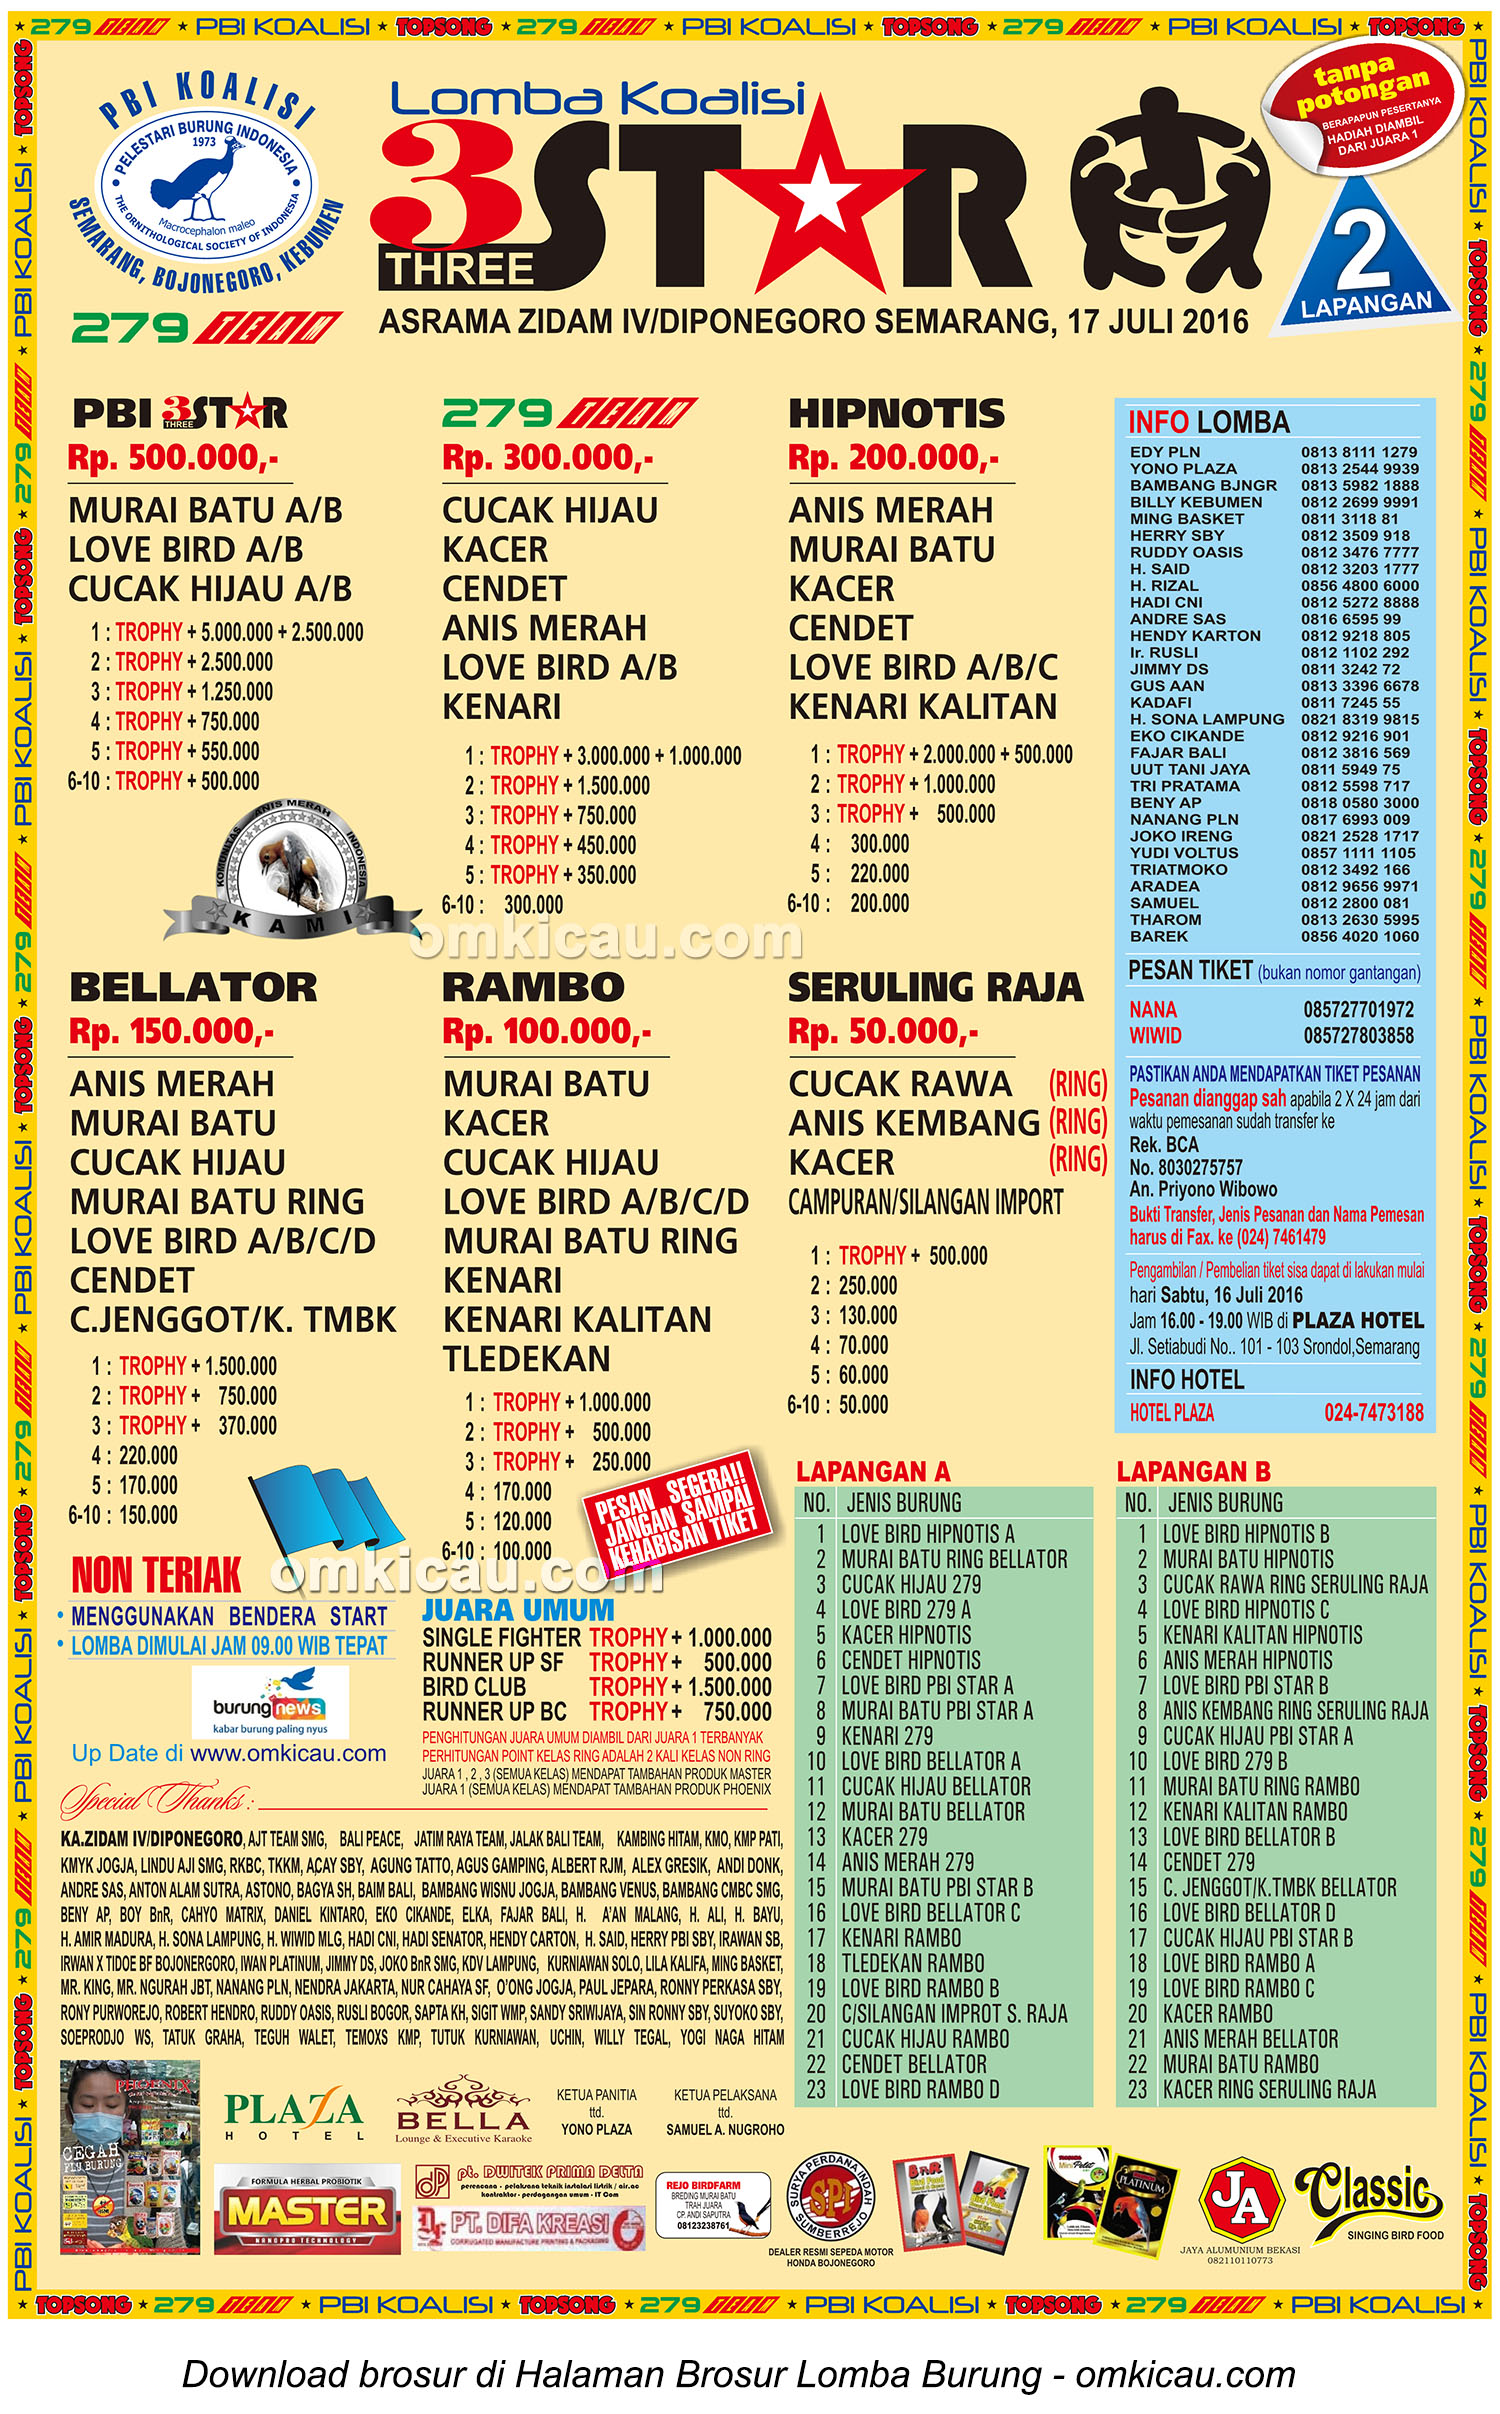 Brosur Lomba Burung Berkicau 3 Star, Semarang, 17 Juli 2016